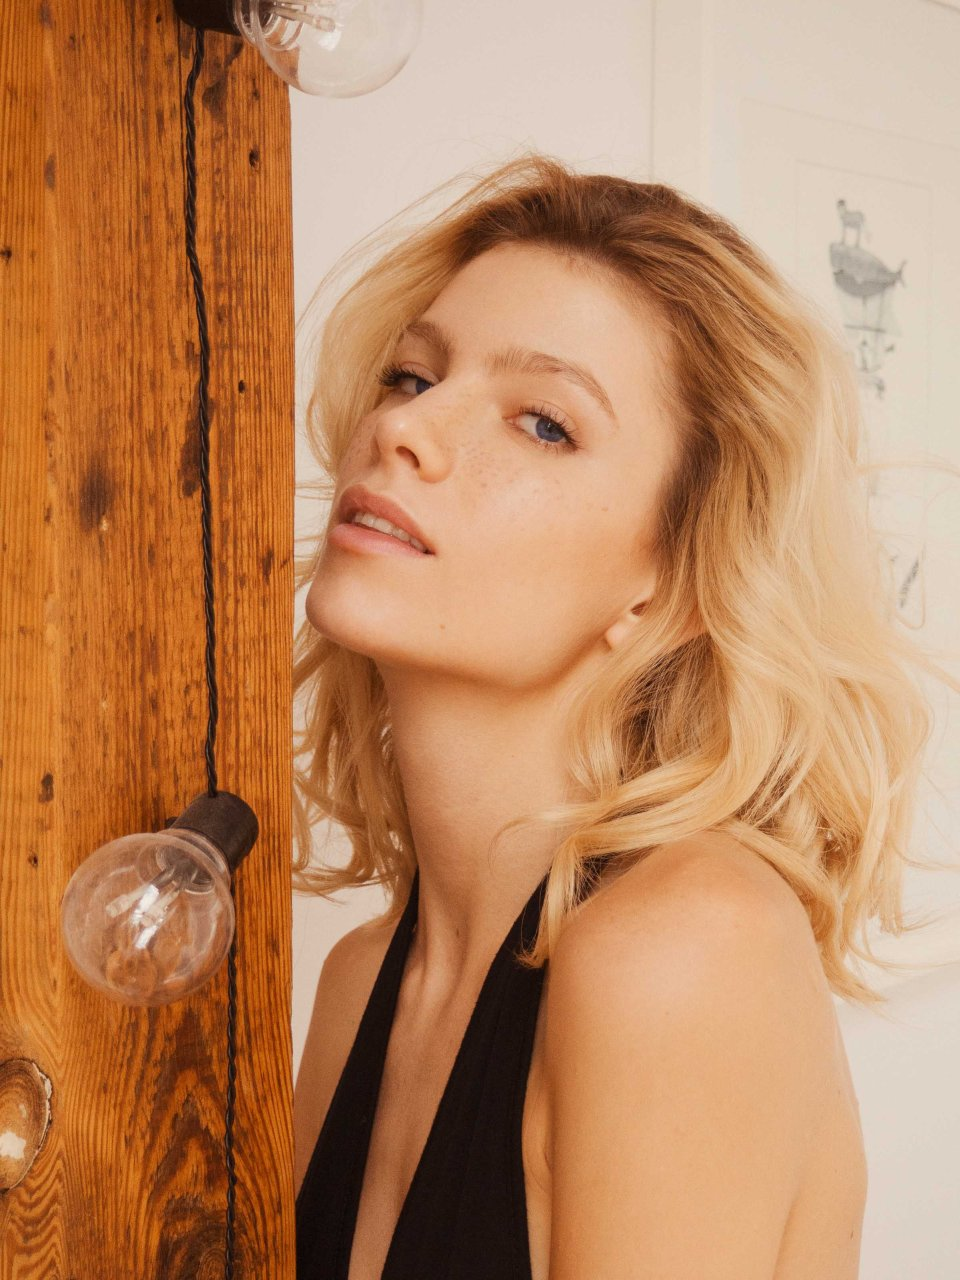 XXX Angela Olszewska naked (79 photo), Ass, Leaked, Twitter, lingerie 2015